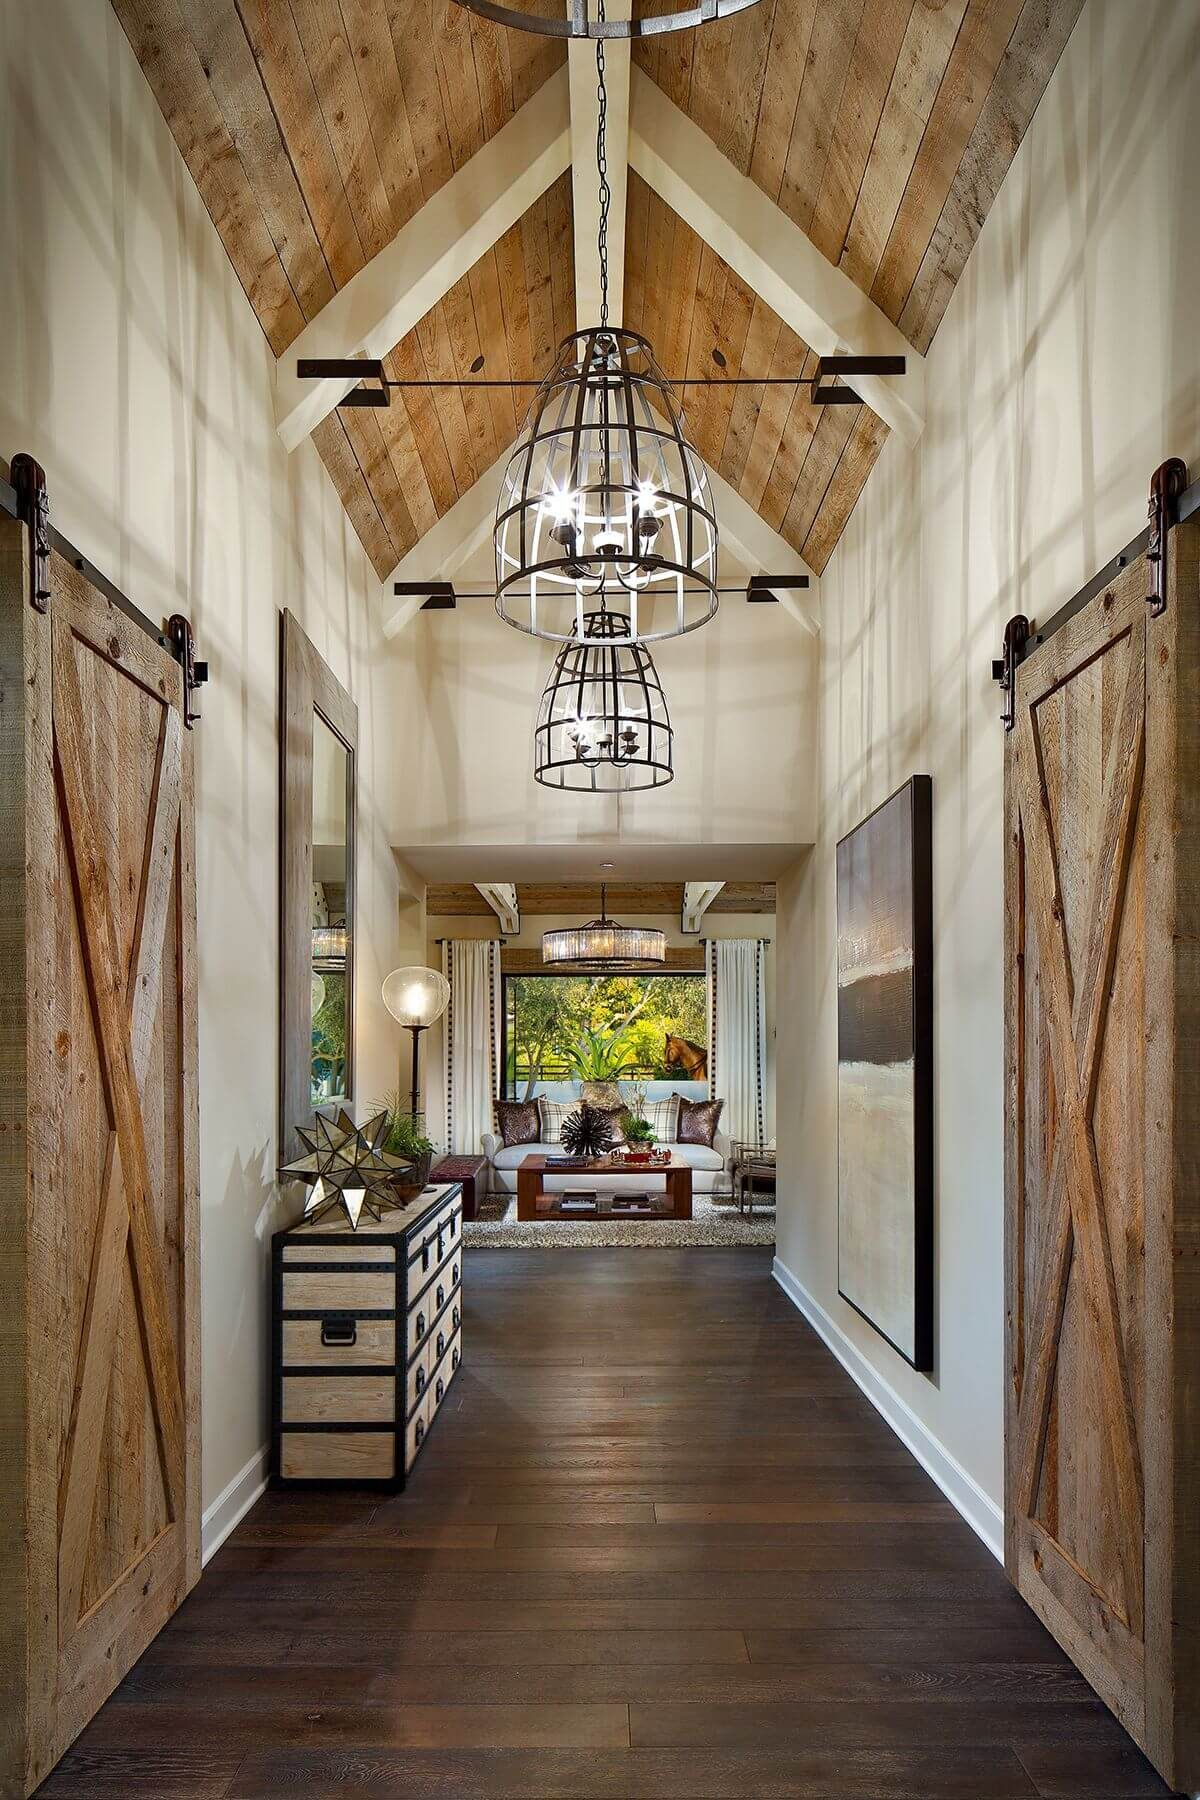 35 Rustic Farmhouse Interior Design Ideas That Will Inspire Your